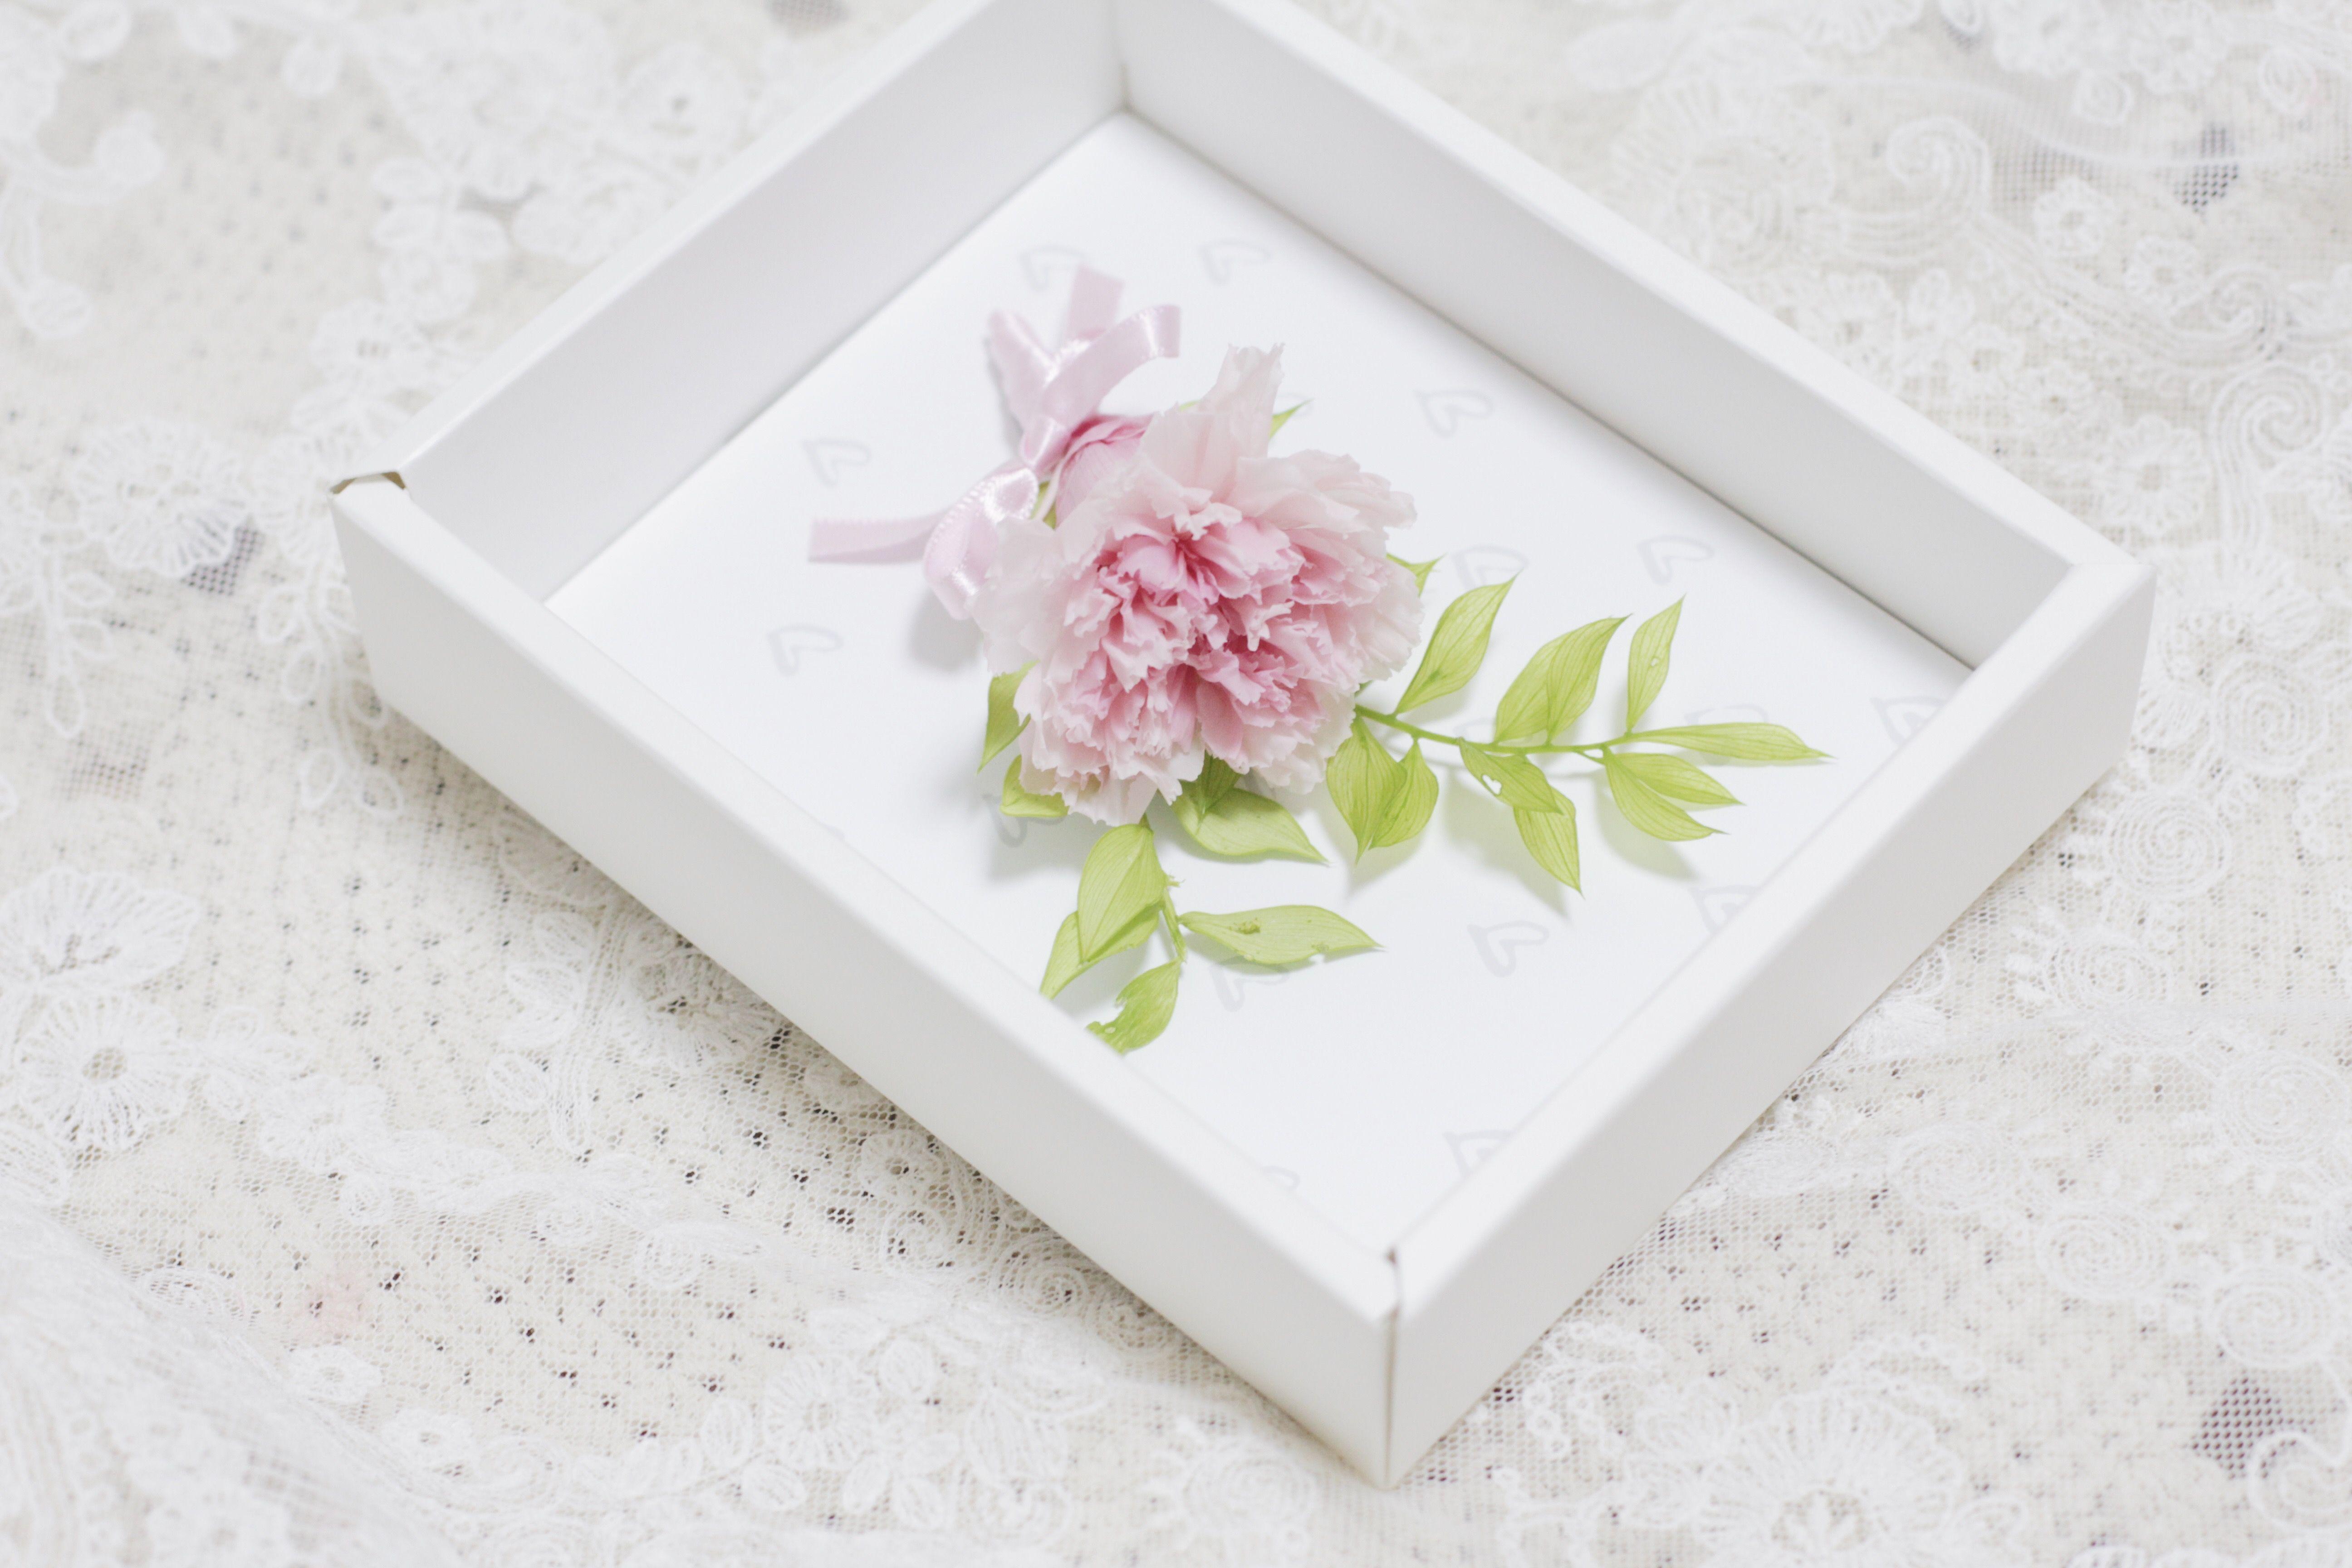 preserved carnation card  instagram @planterior